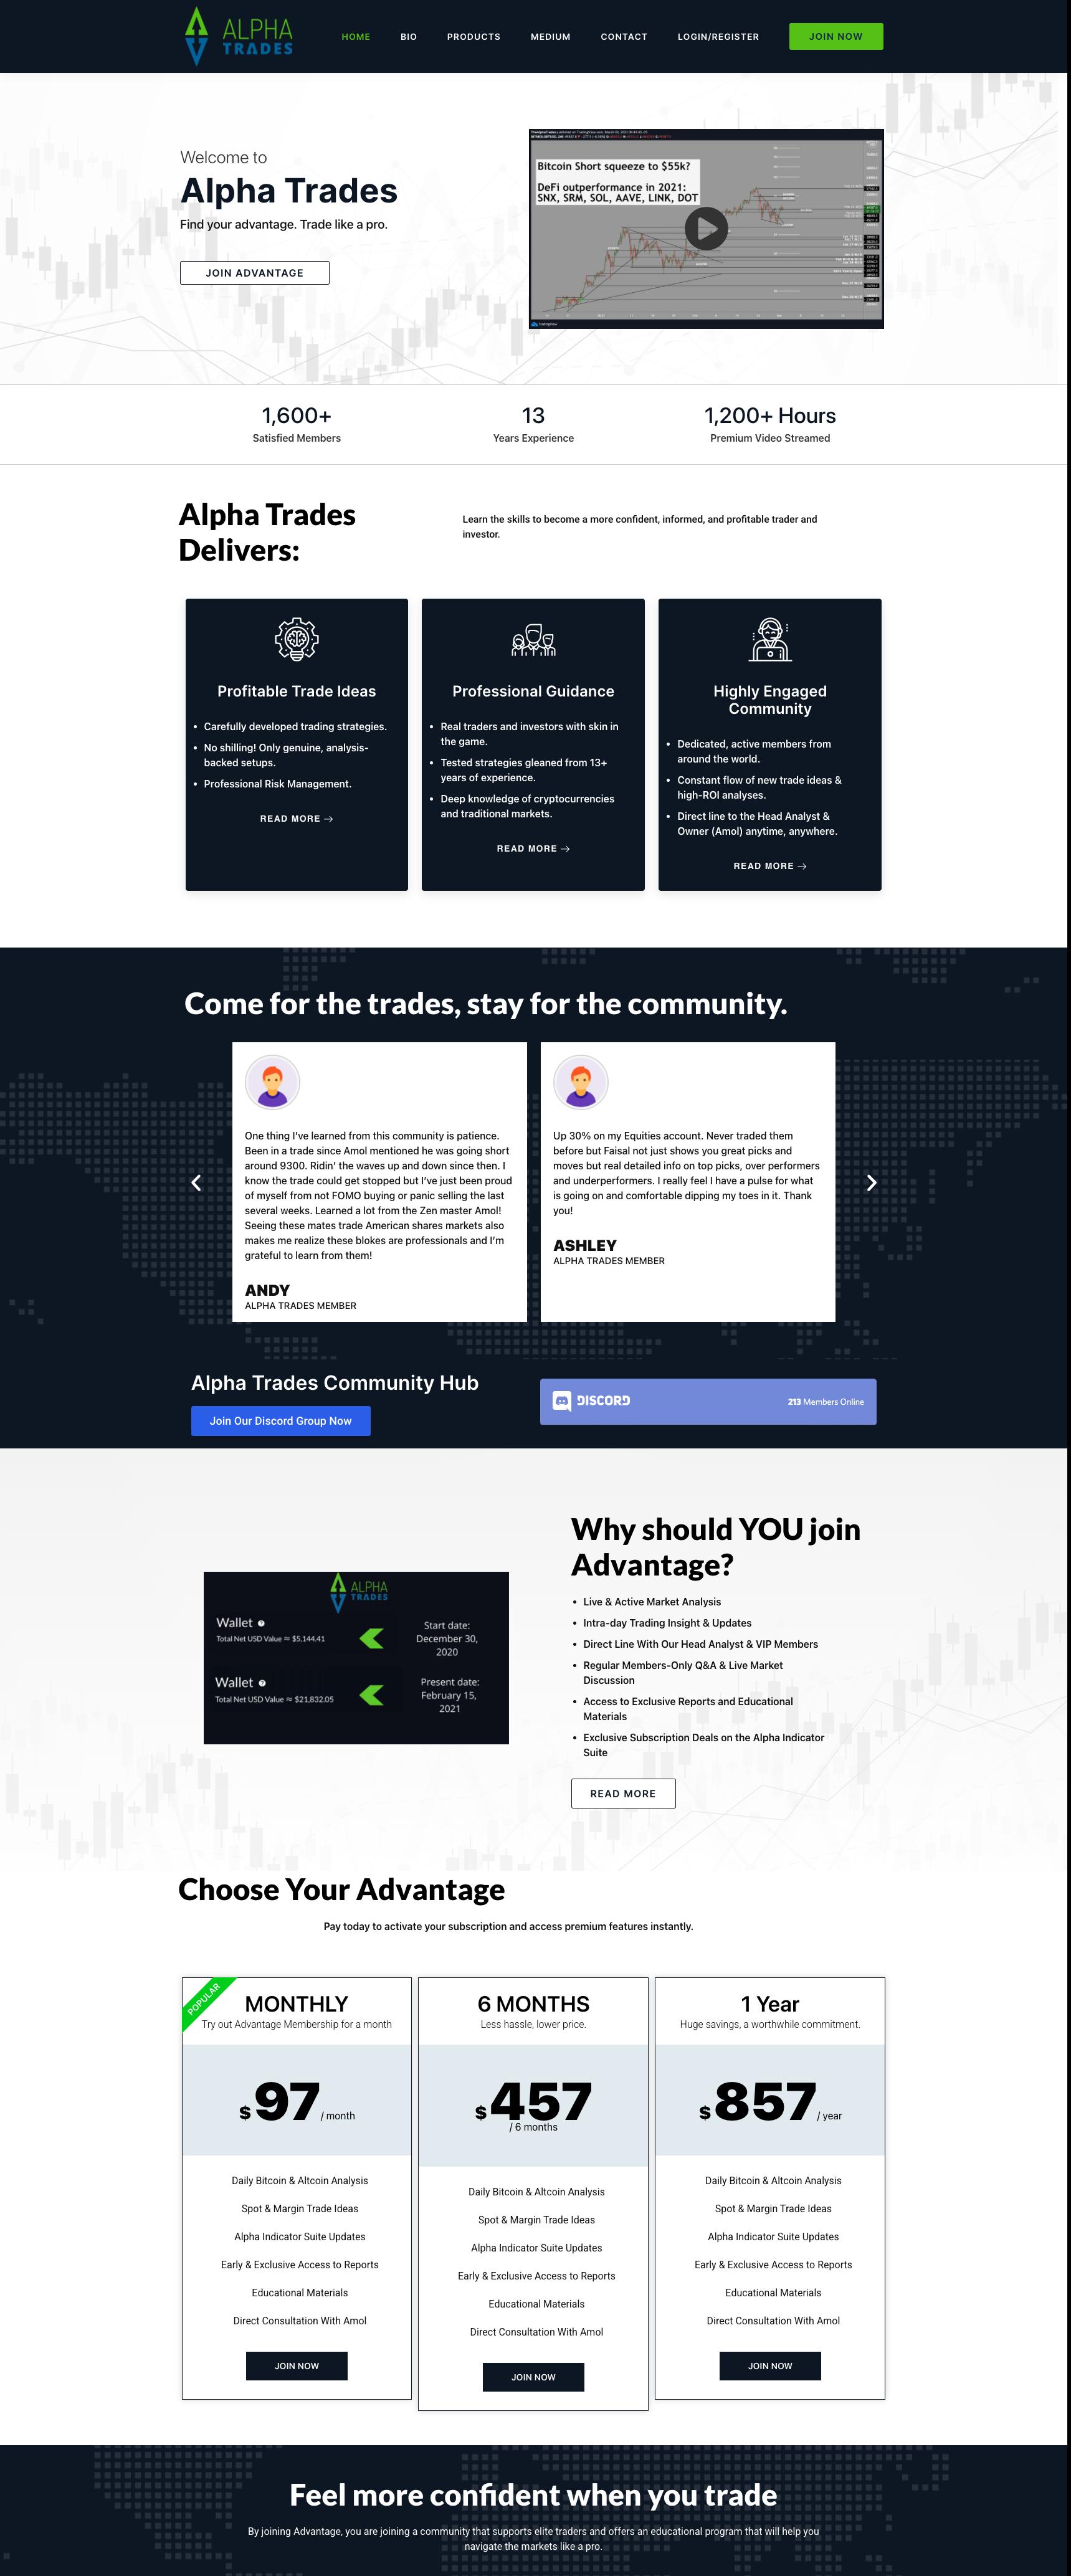 The-AlphaTrades-Find-your-advantage-Trade-like-a-pro-